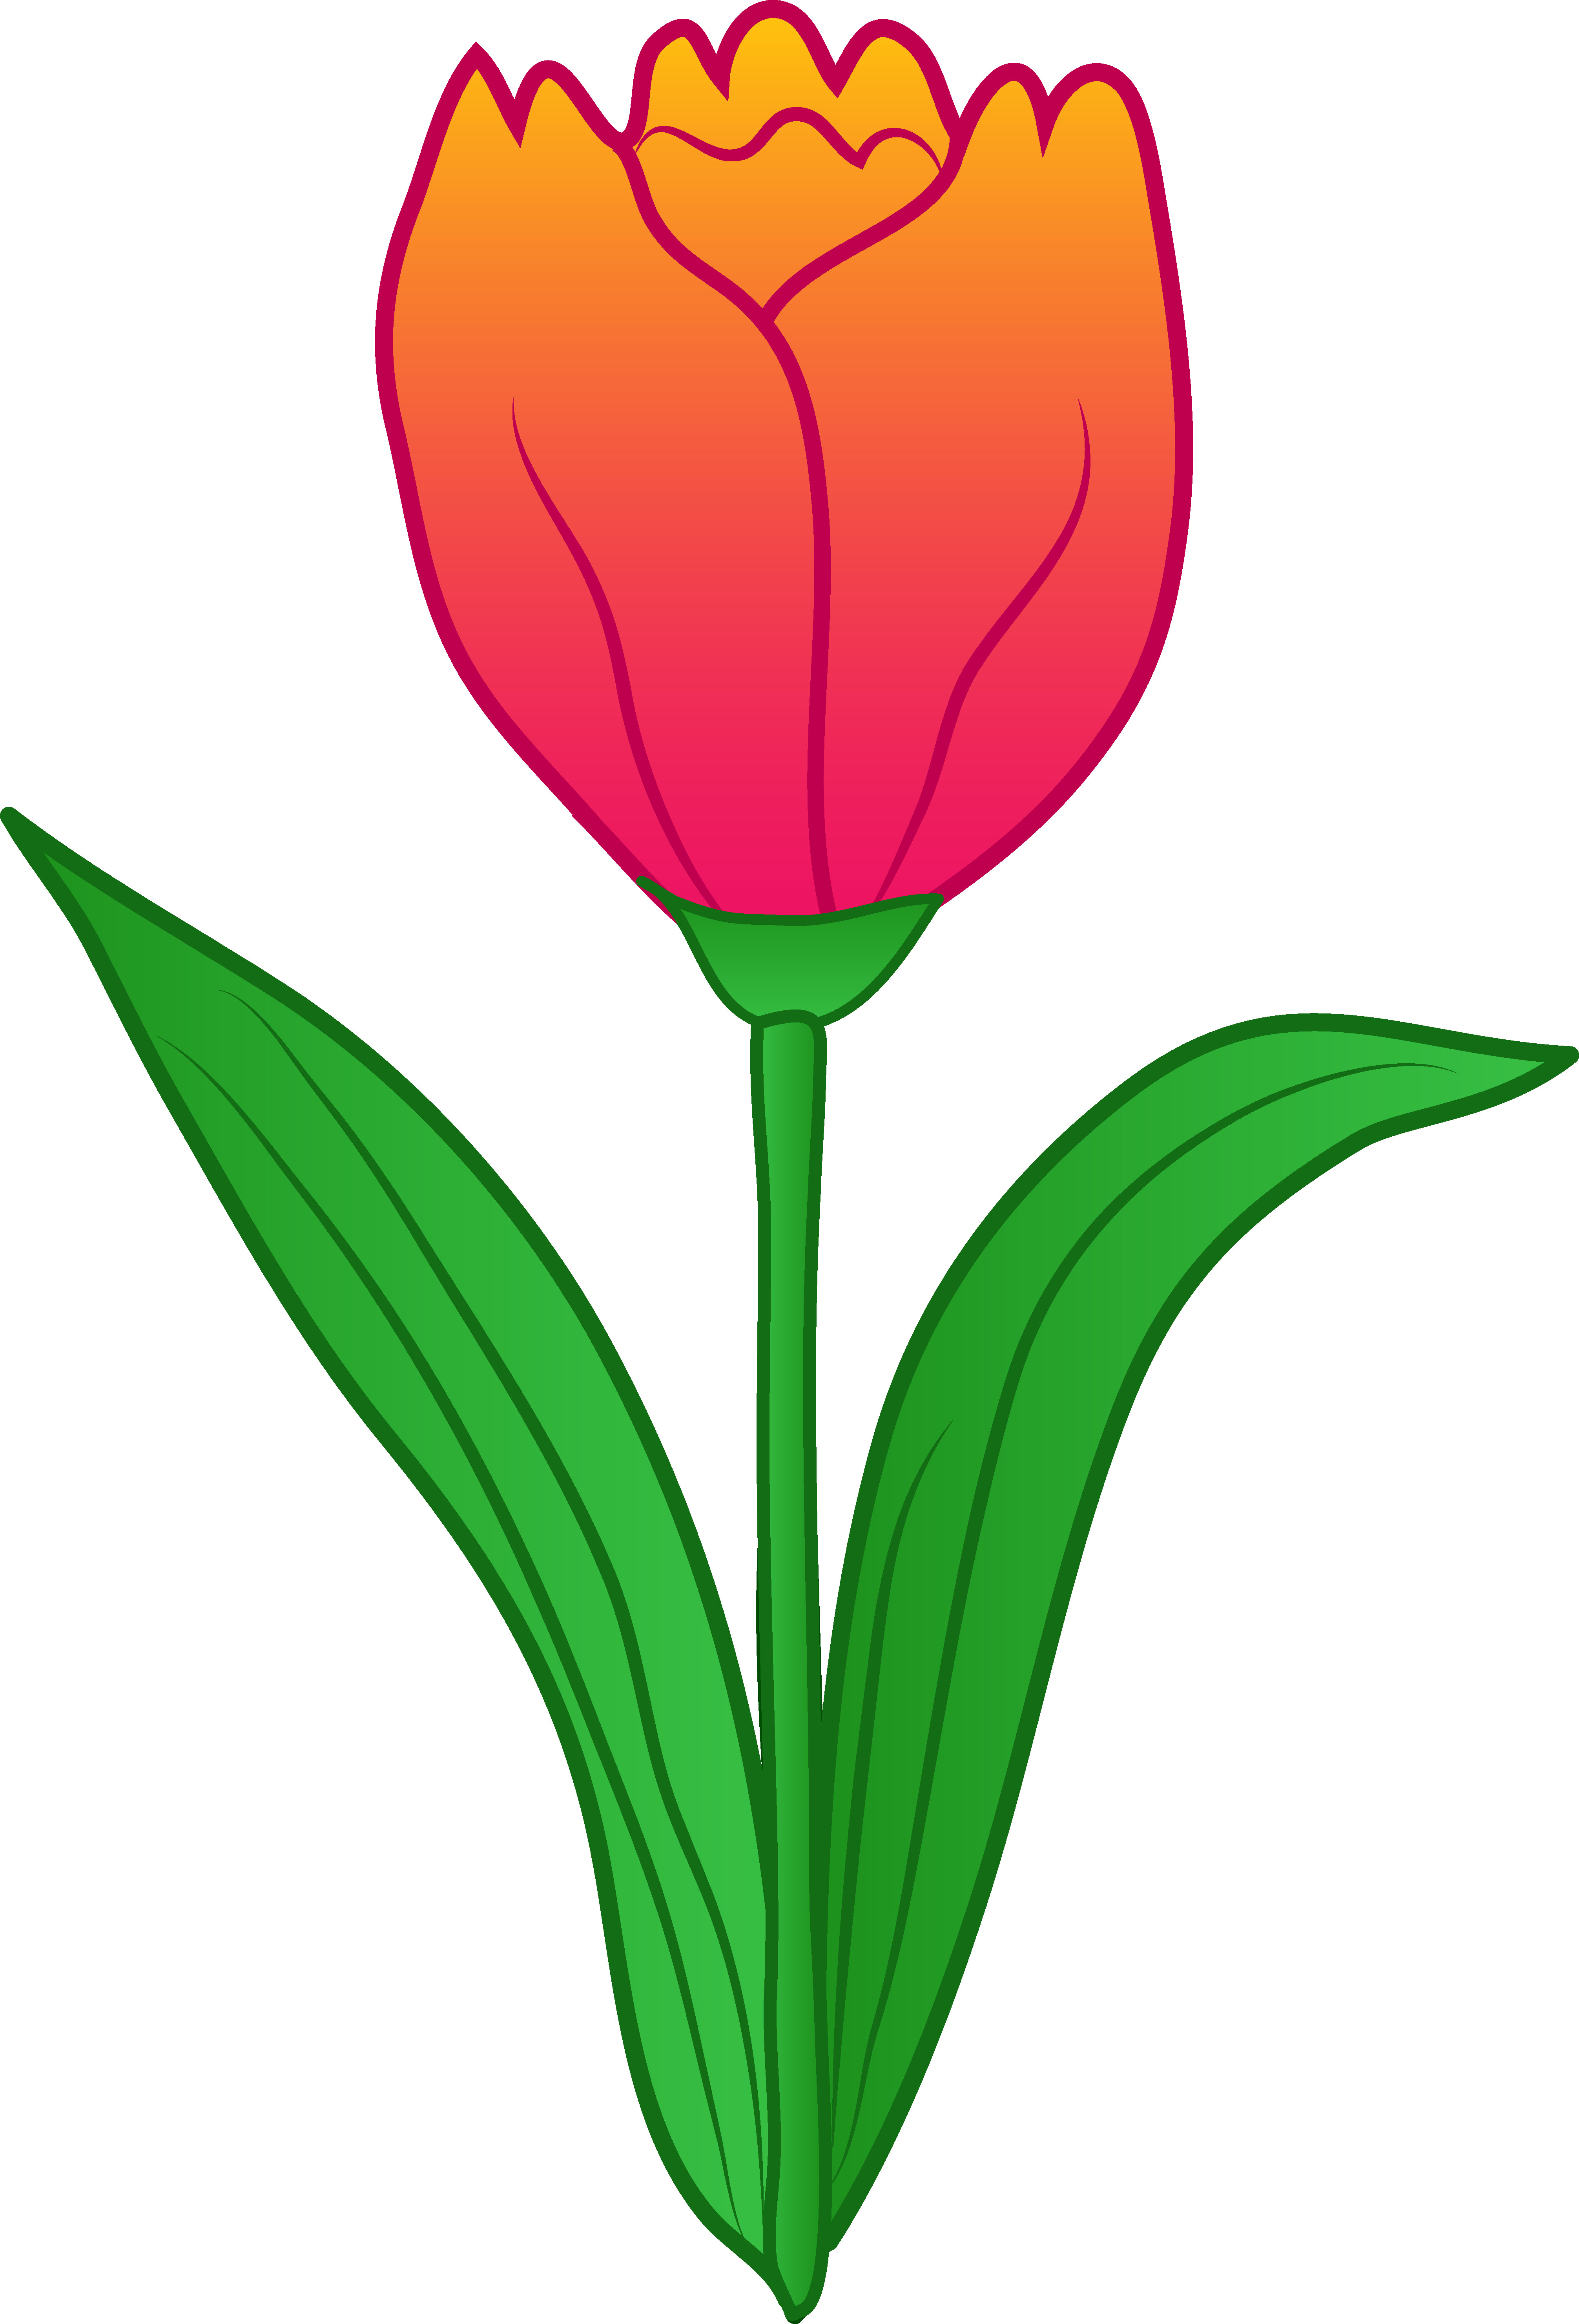 Clipart tulip cute.